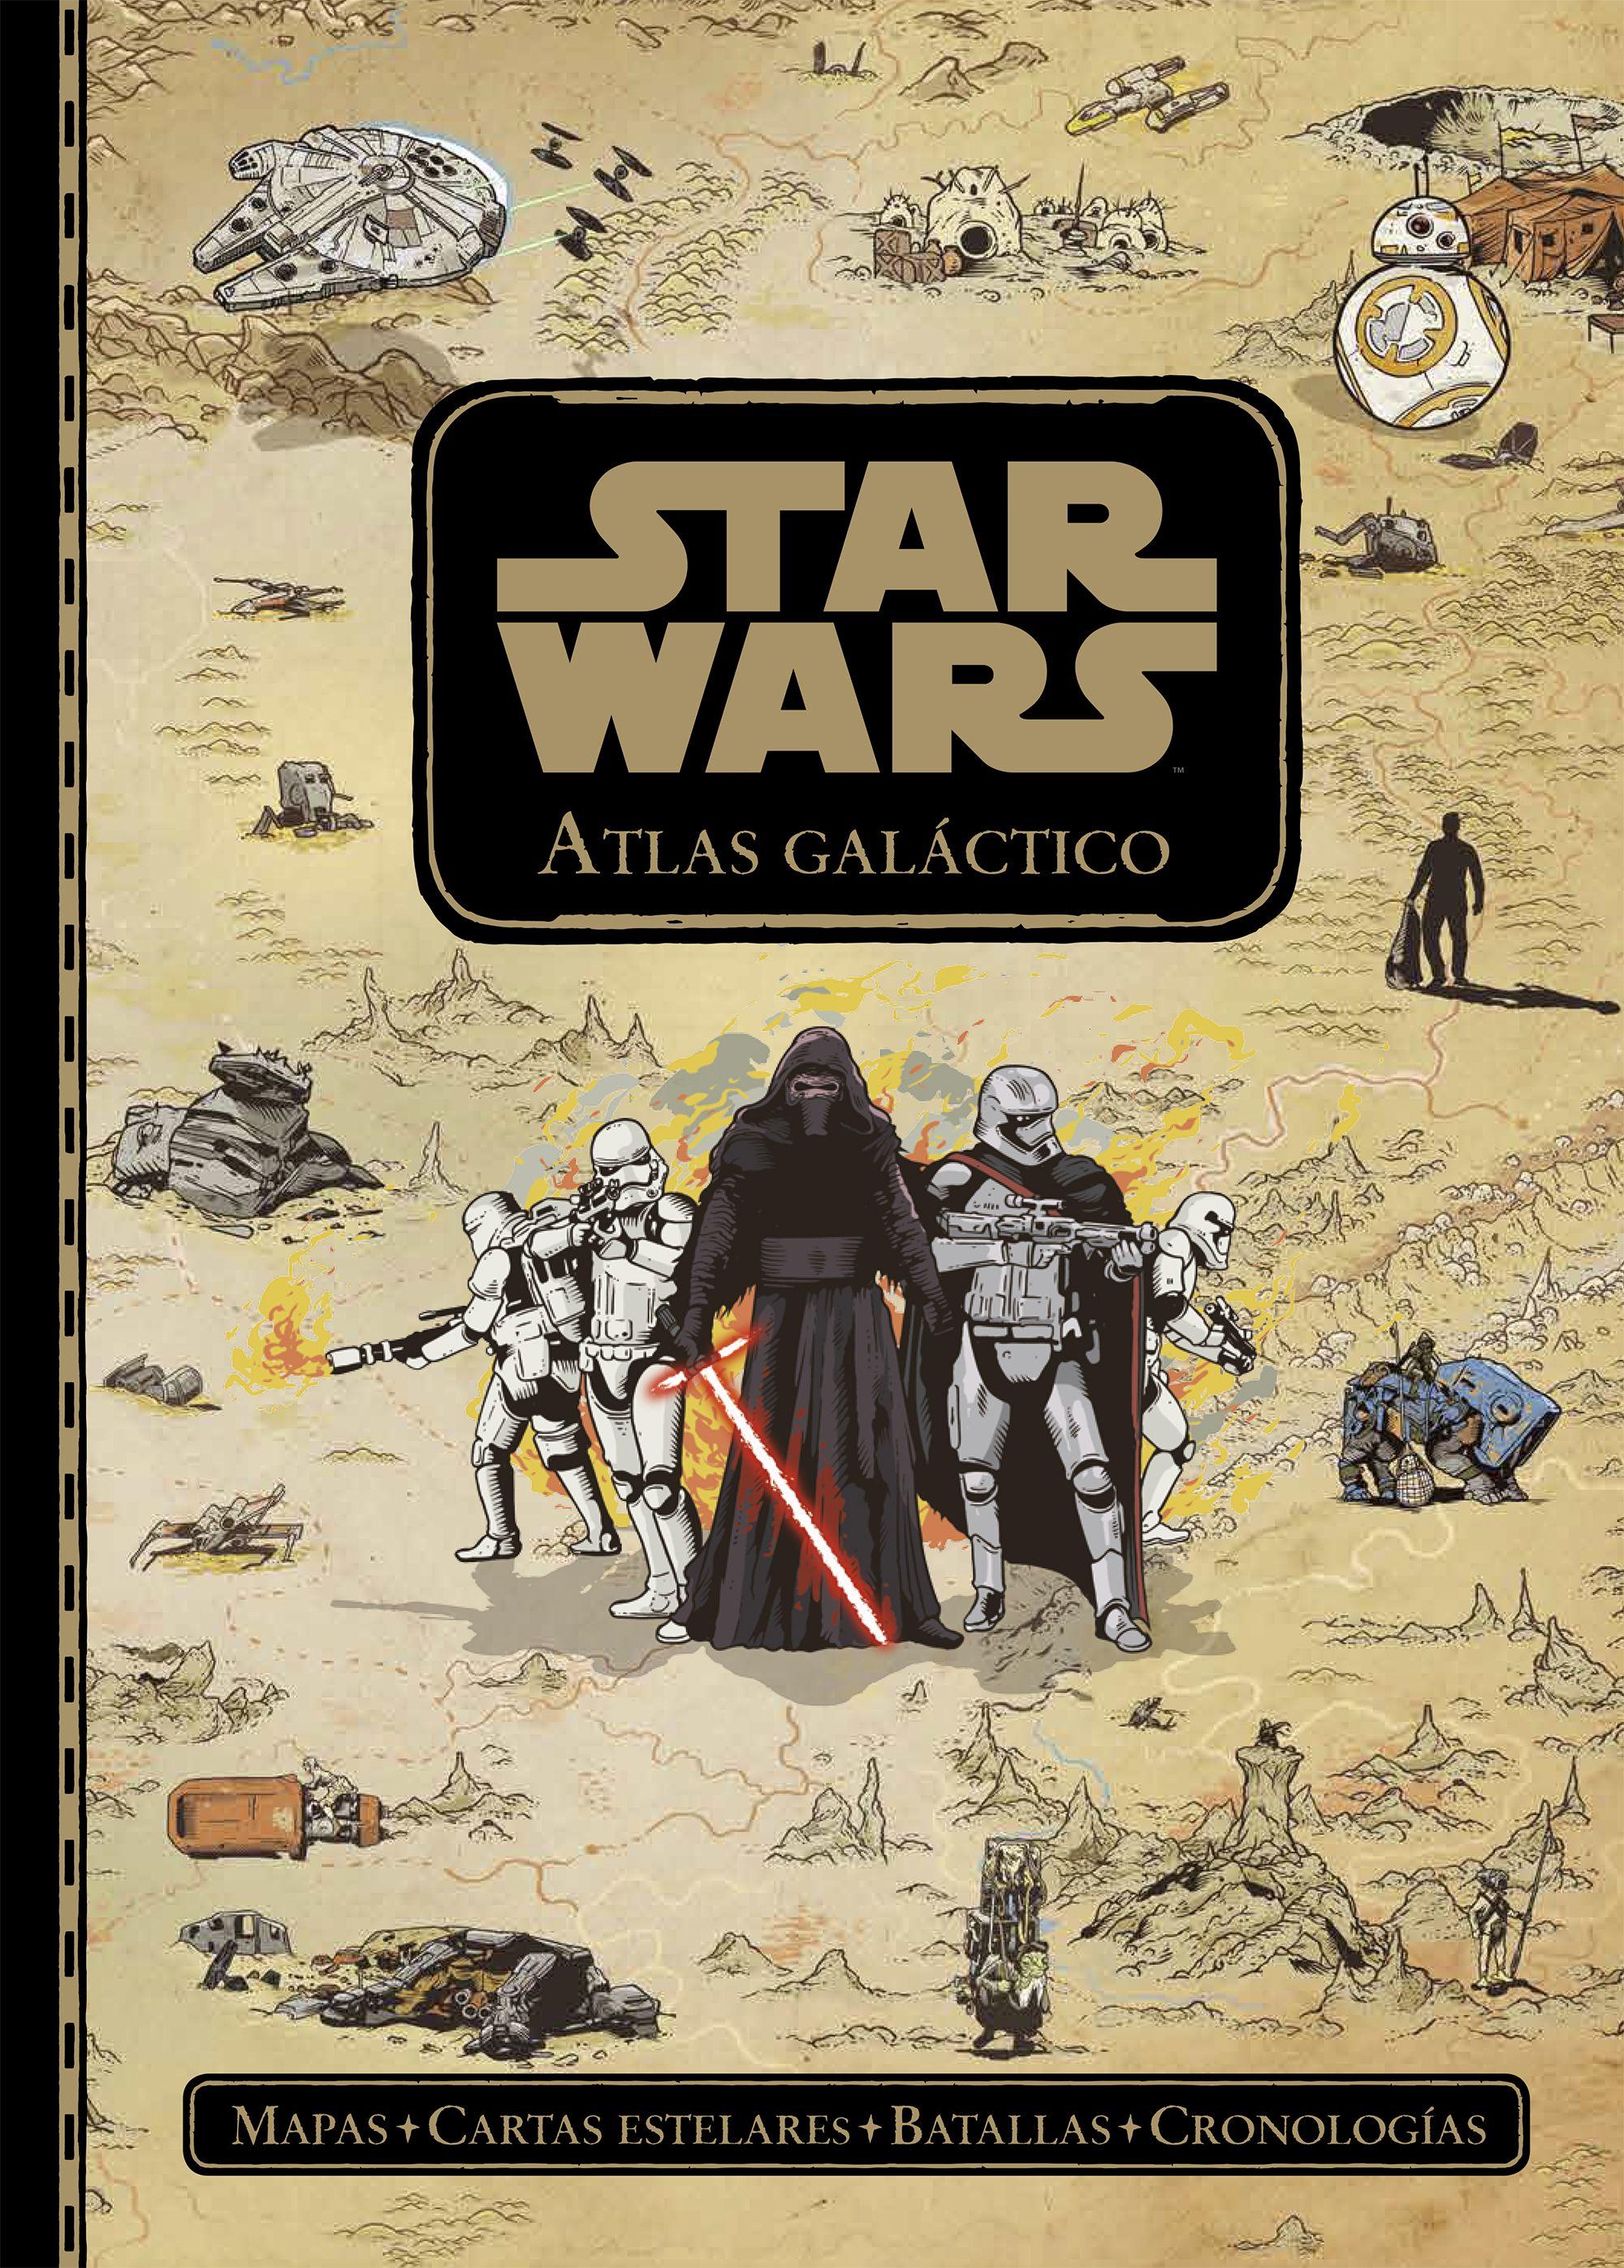 Star Wars Atlas Galáctico.jpg